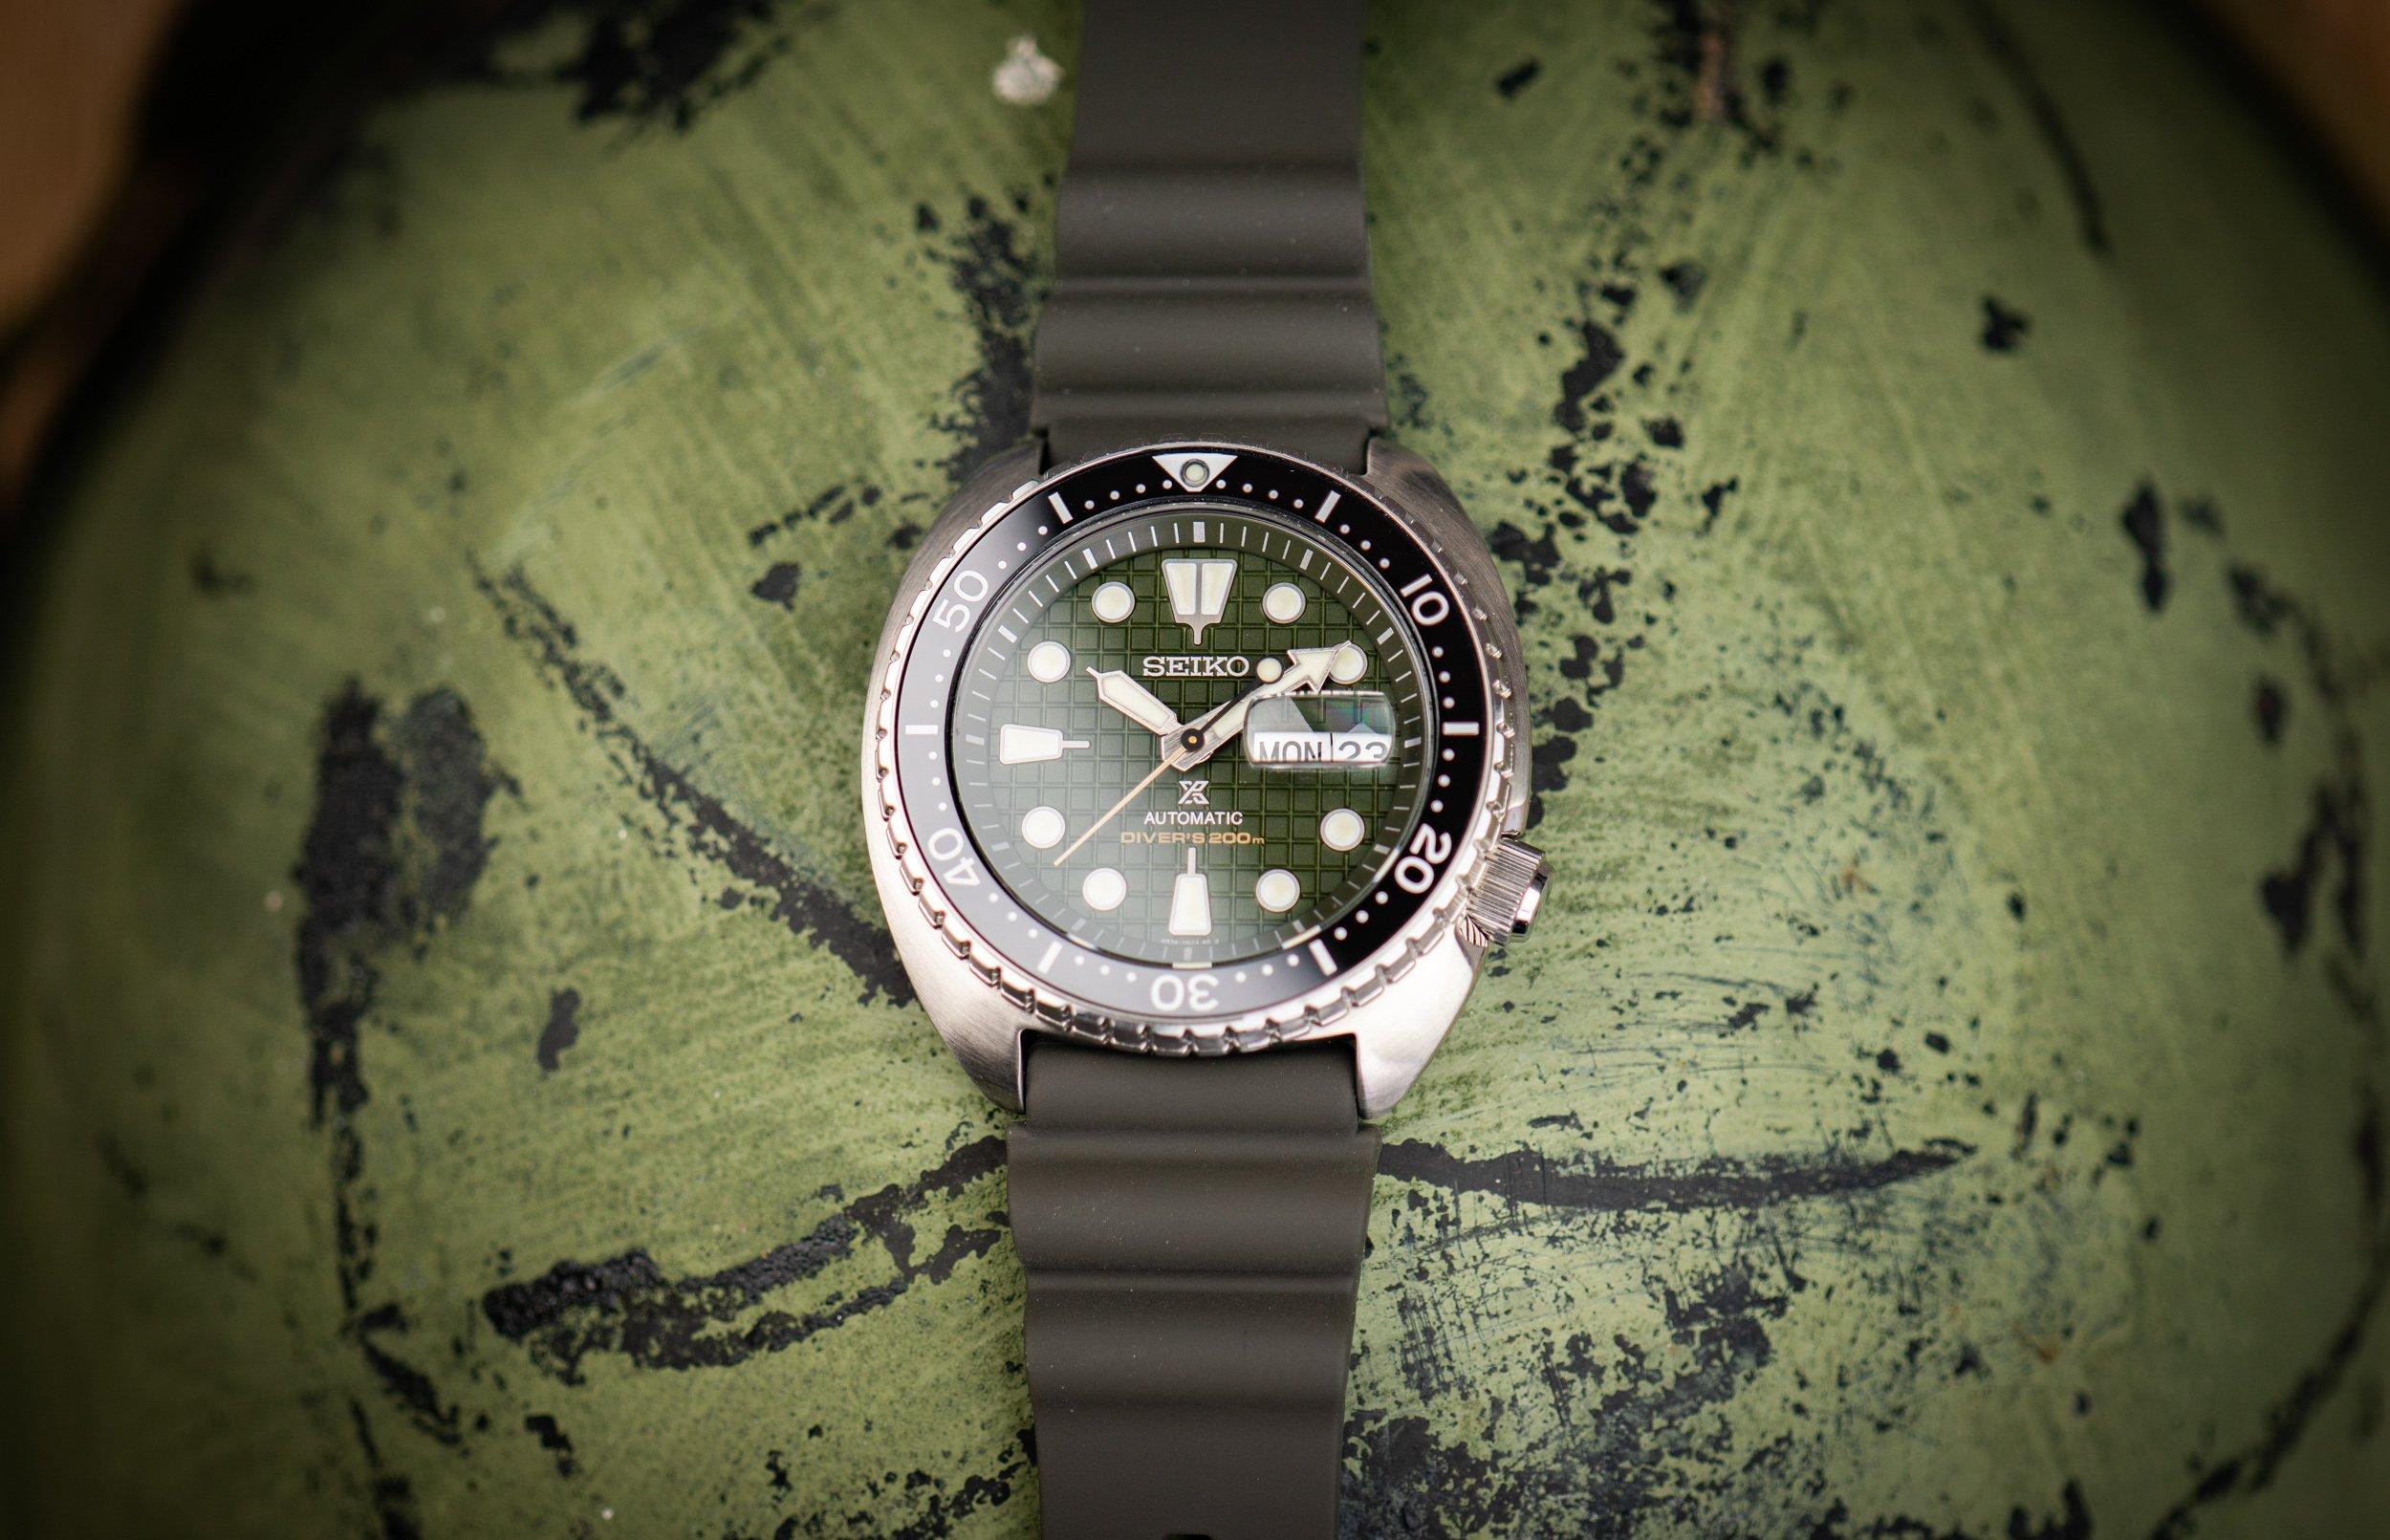 Seiko-Prospex-Diver-200m-King-Turtle-2020-Militäruhr-olivgrün-Saphirglas-Keramik-Test